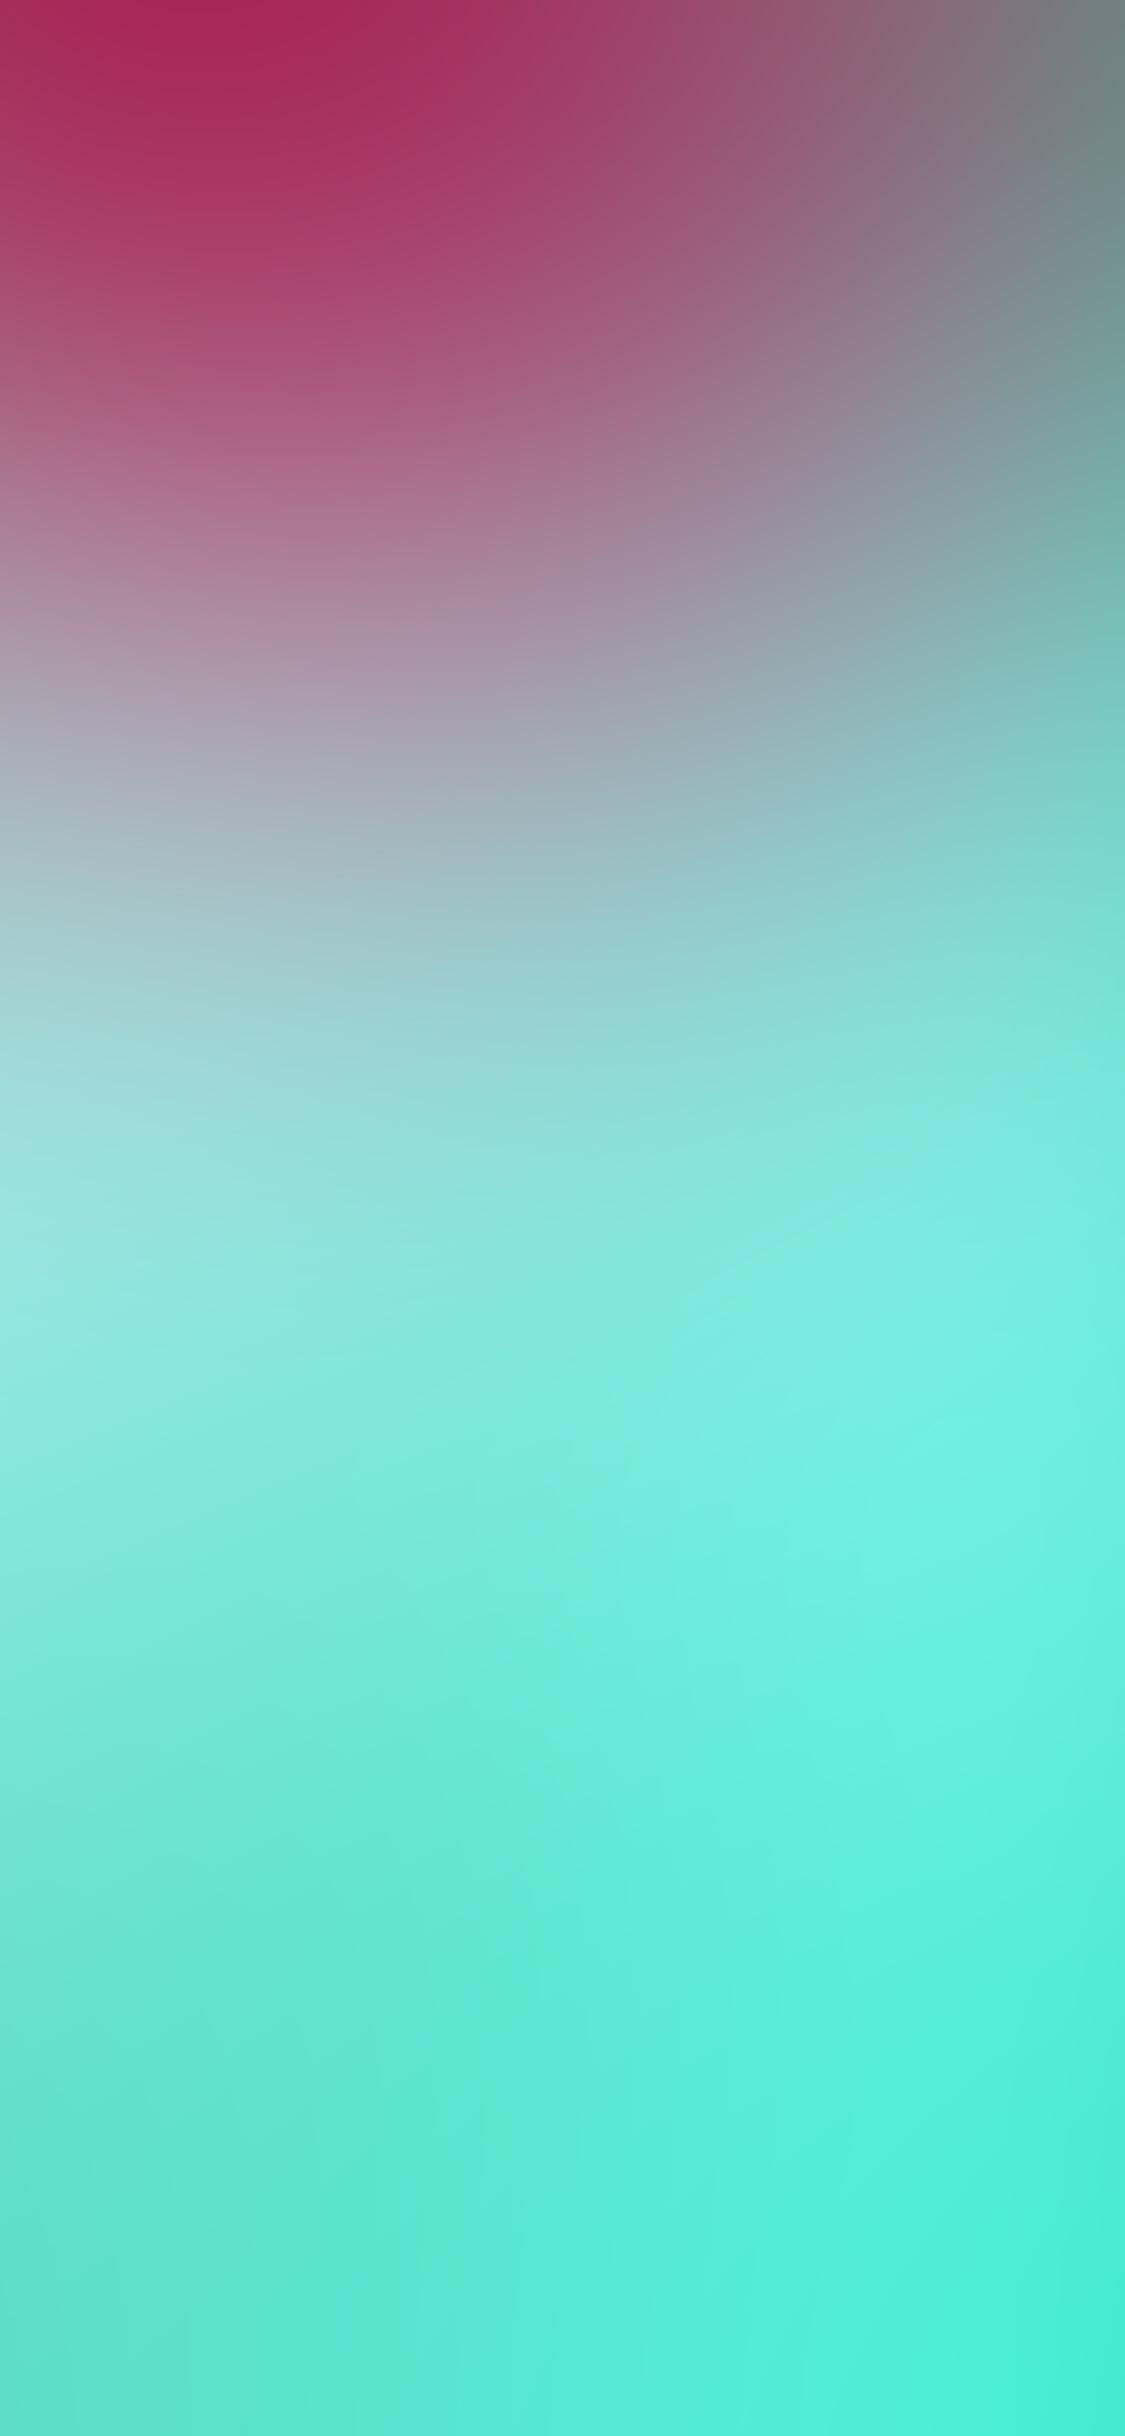 iPhonexpapers.com-Apple-iPhone-wallpaper-sn46-red-dot-green-blur-gradation